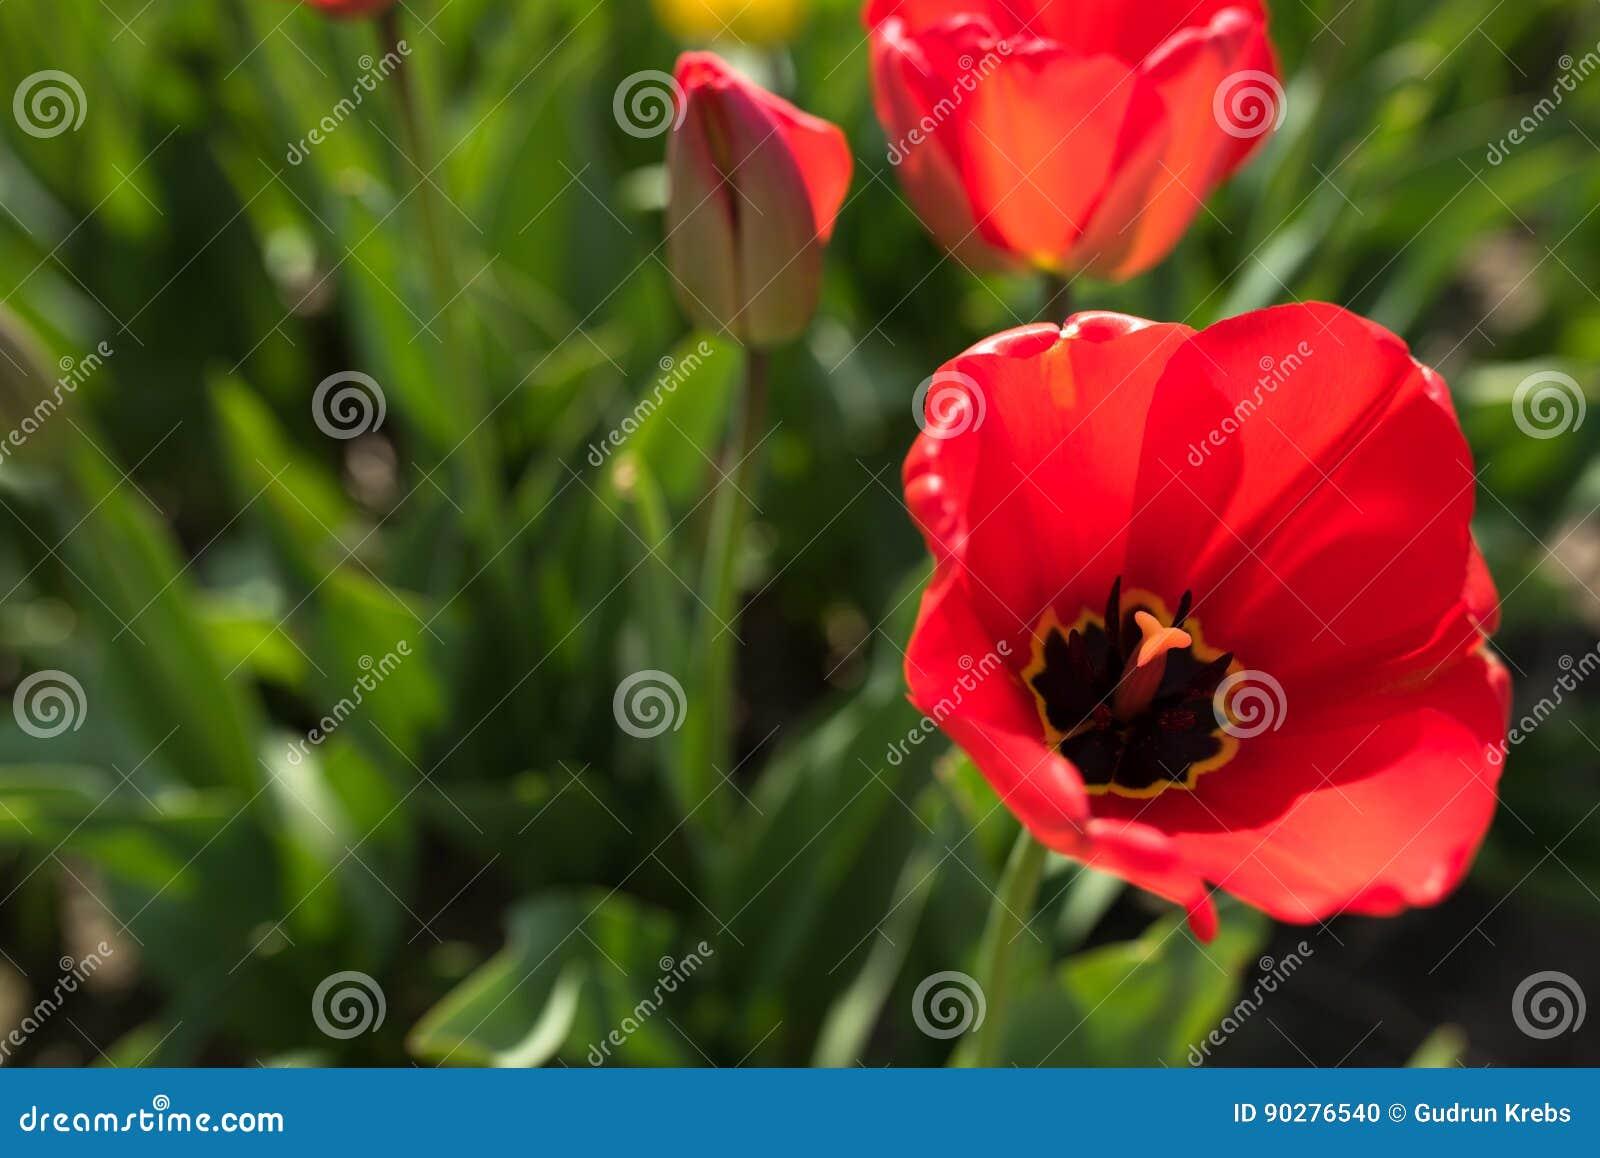 Motif de ressort avec les tulipes rouges